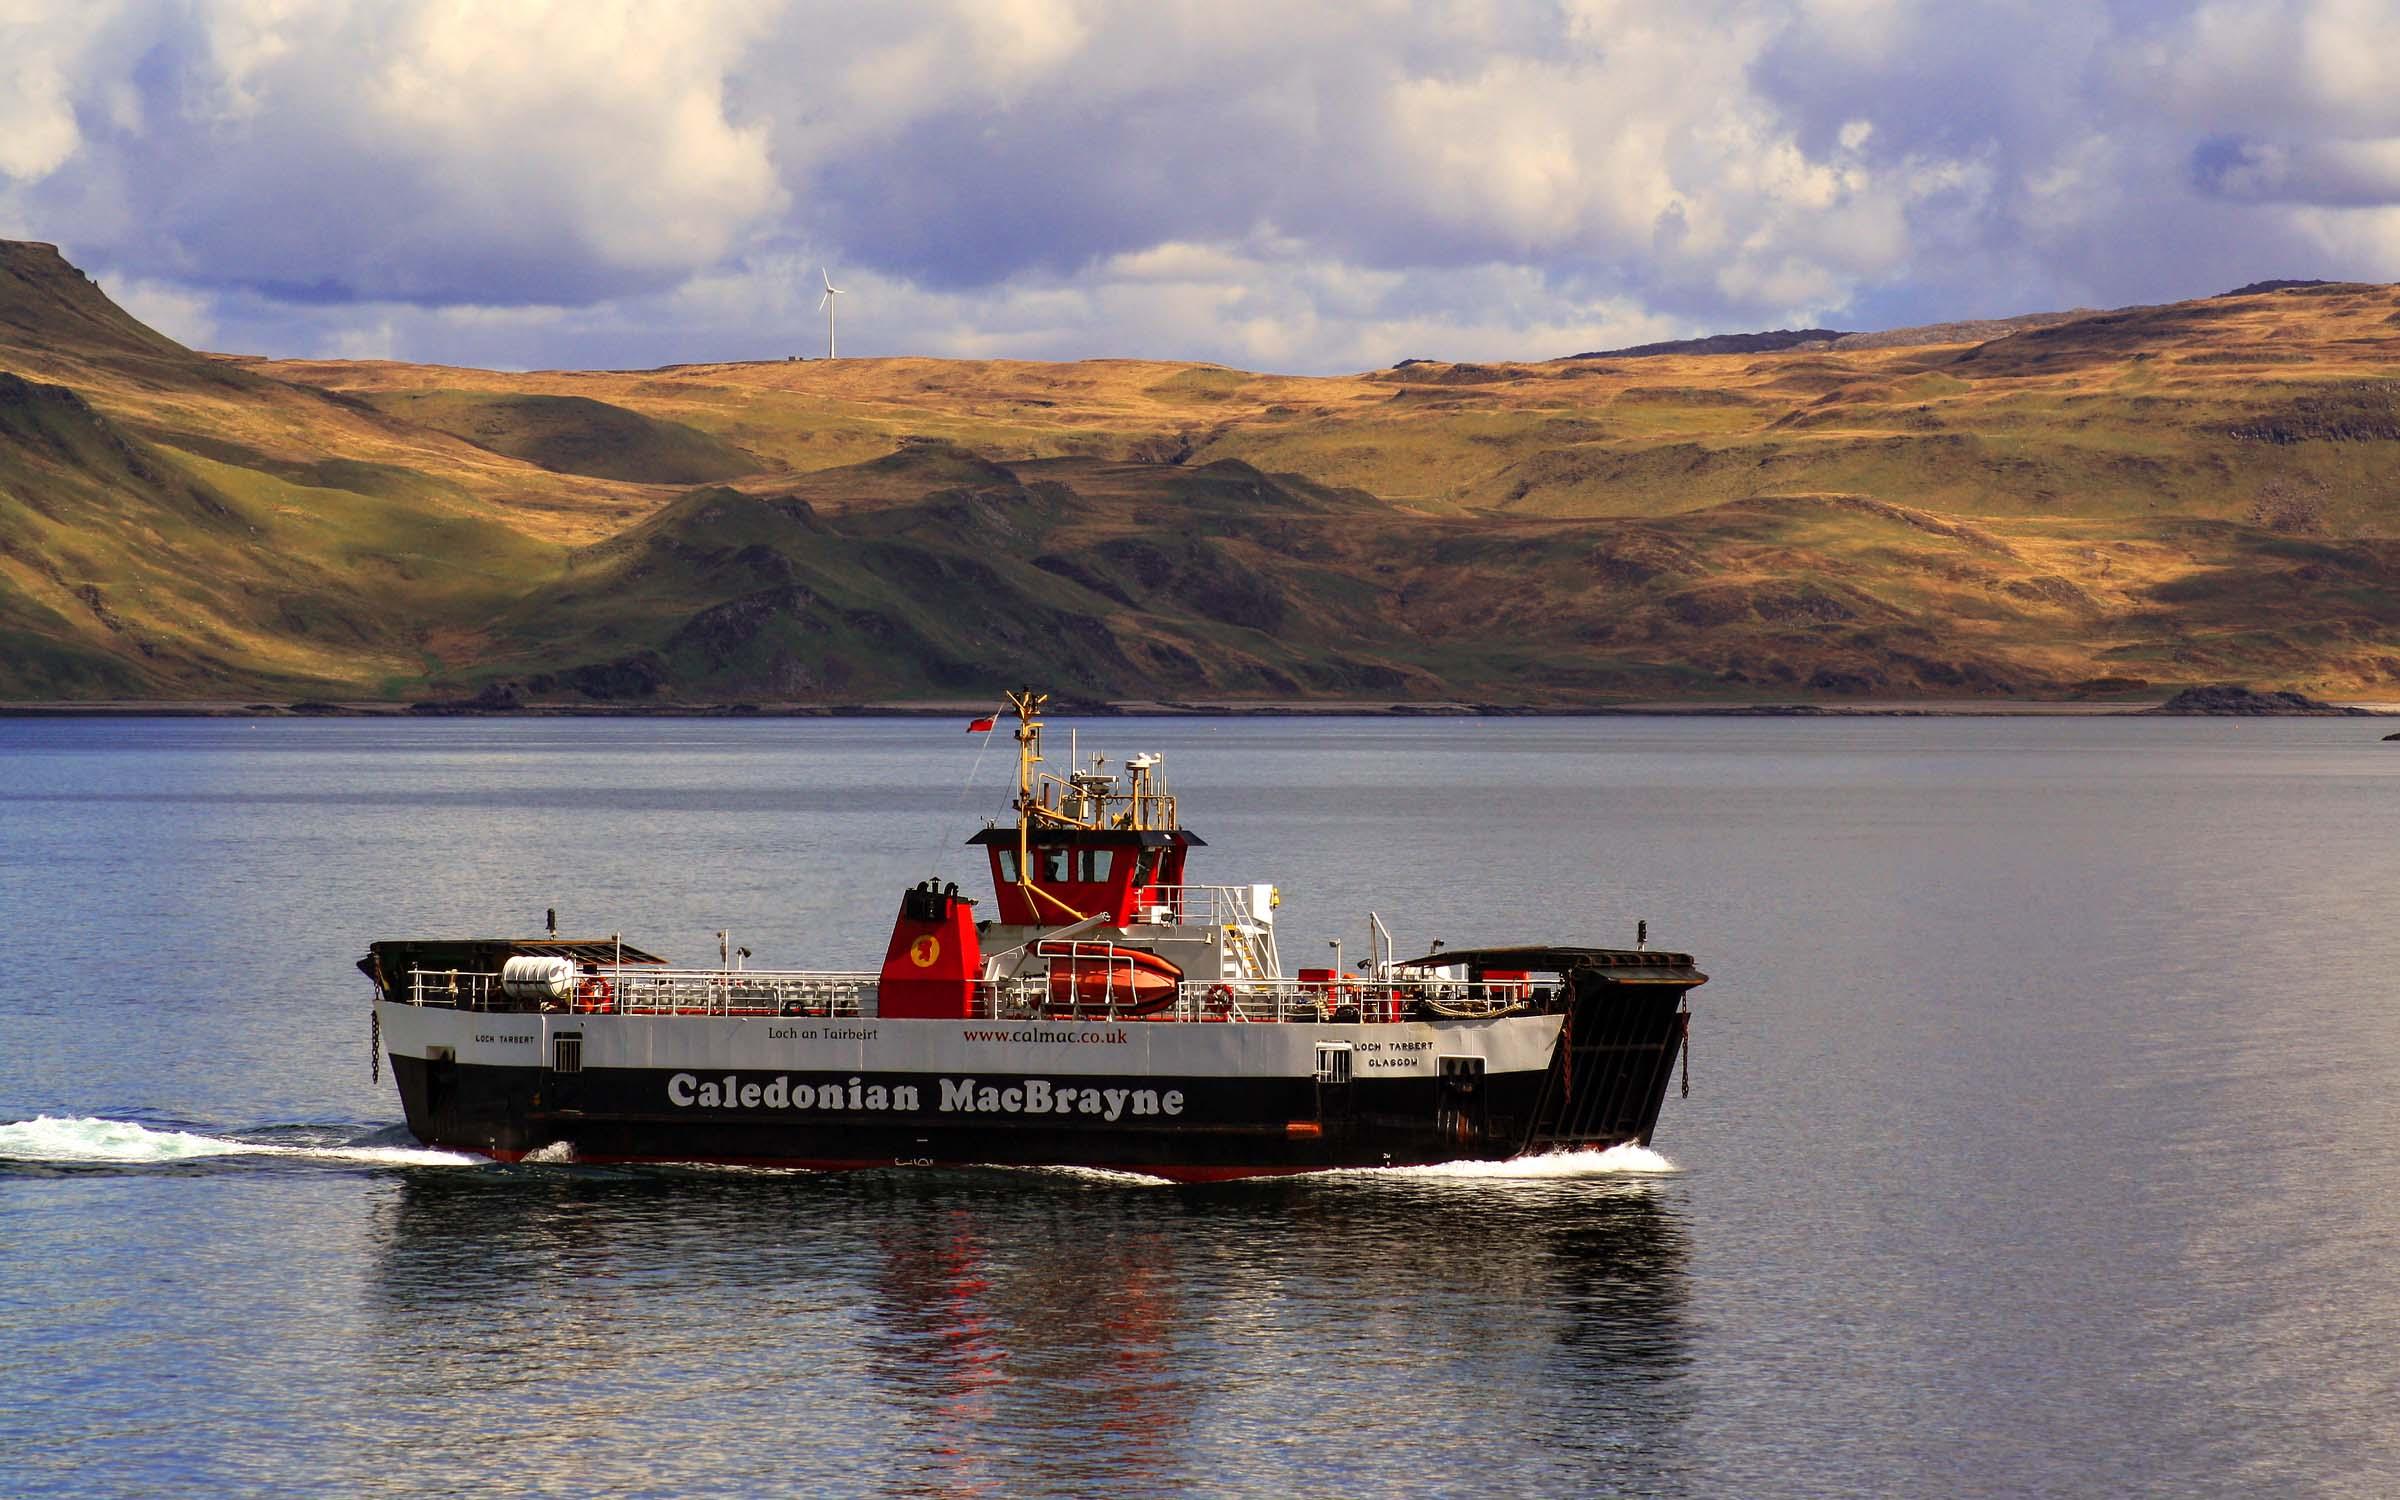 Loch Tarbert in the Sound of Mull (Ships of CalMac)